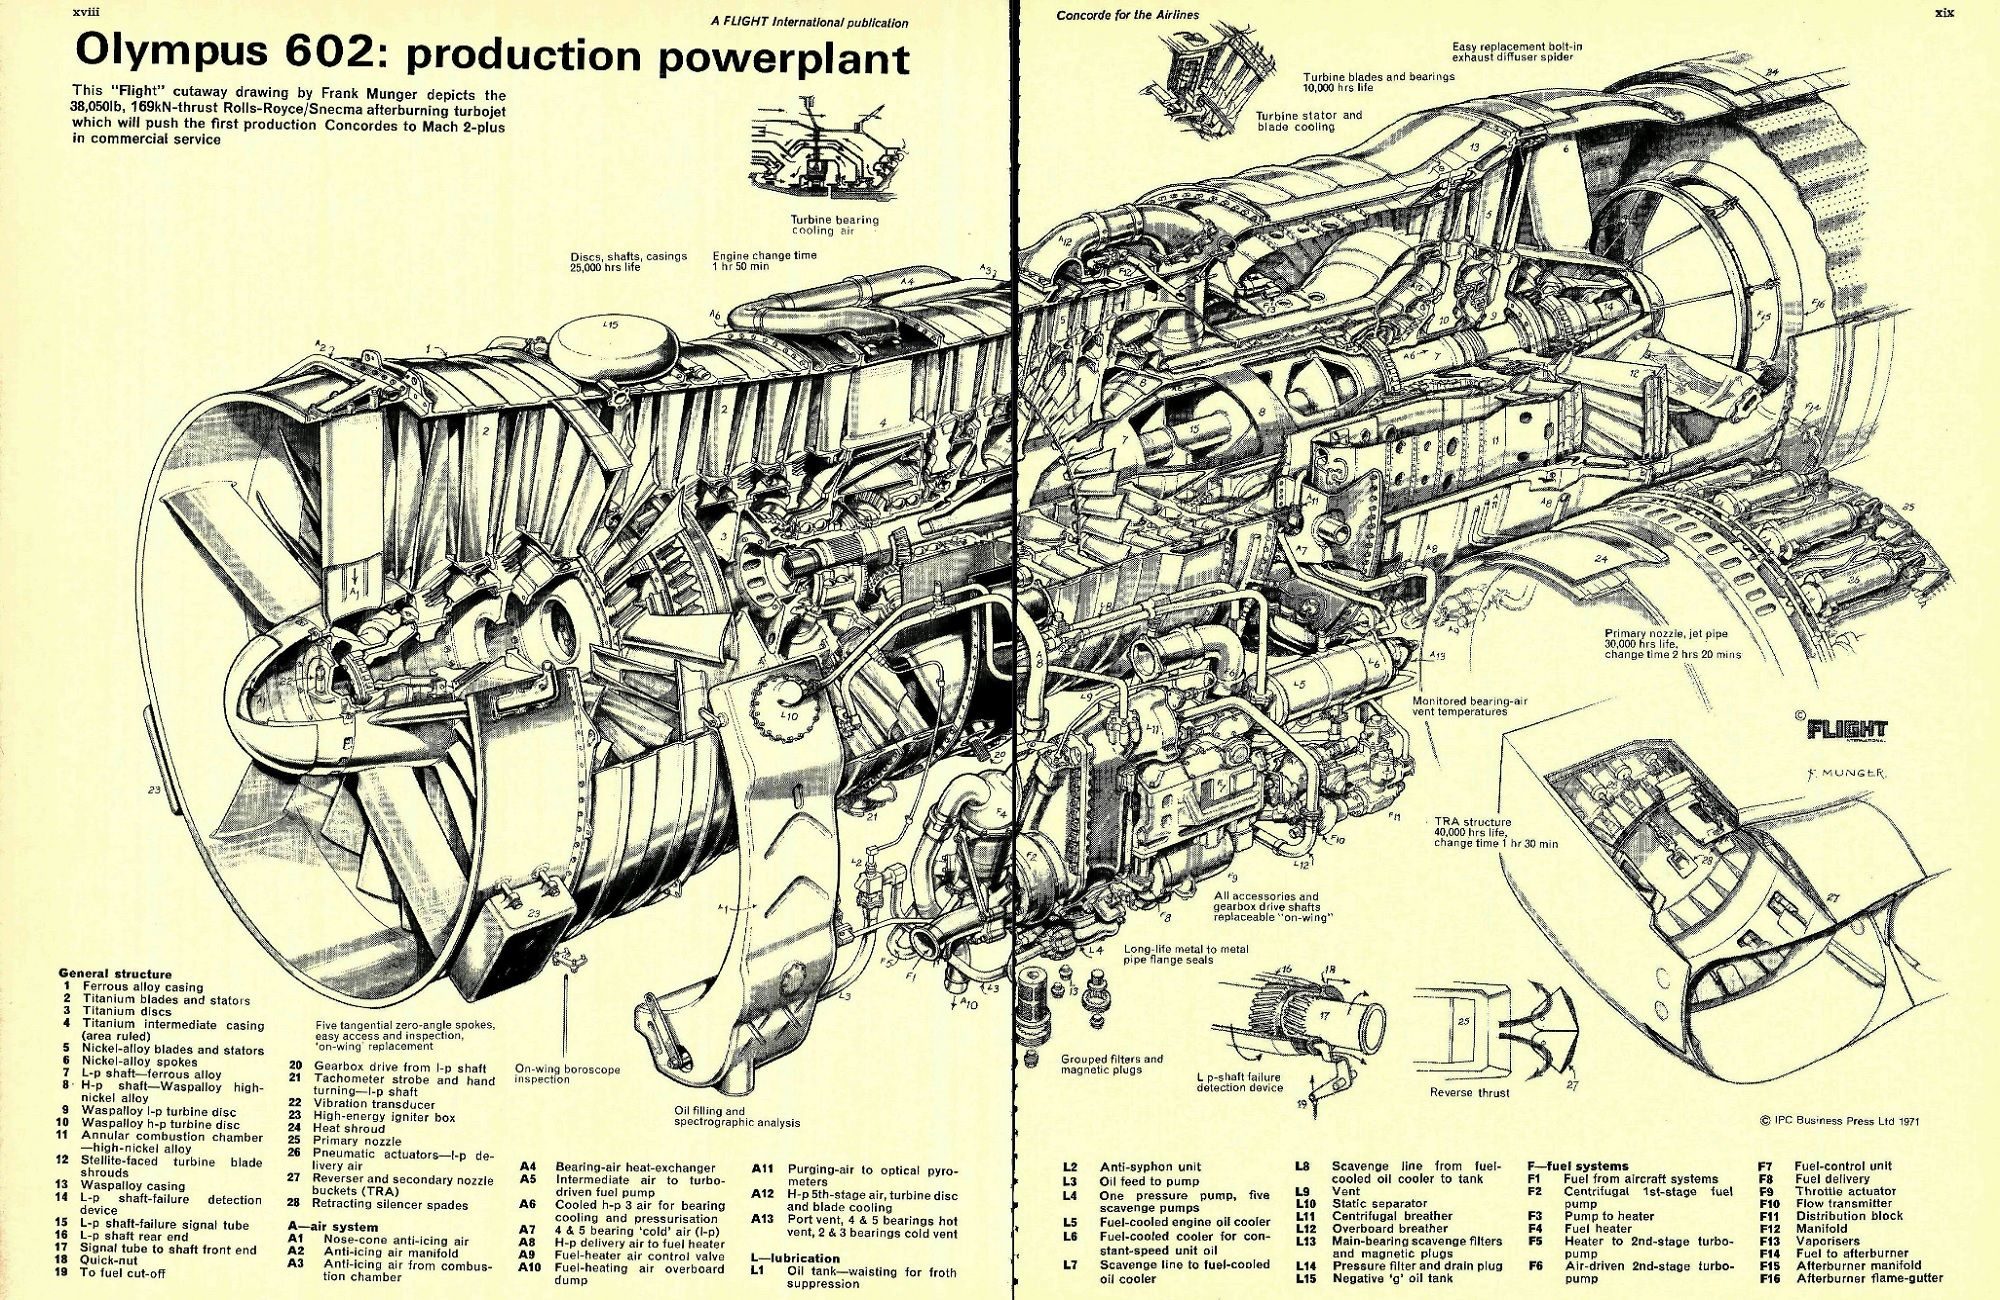 Rolls Snecma Olympus 602 Afterburning Turbojet